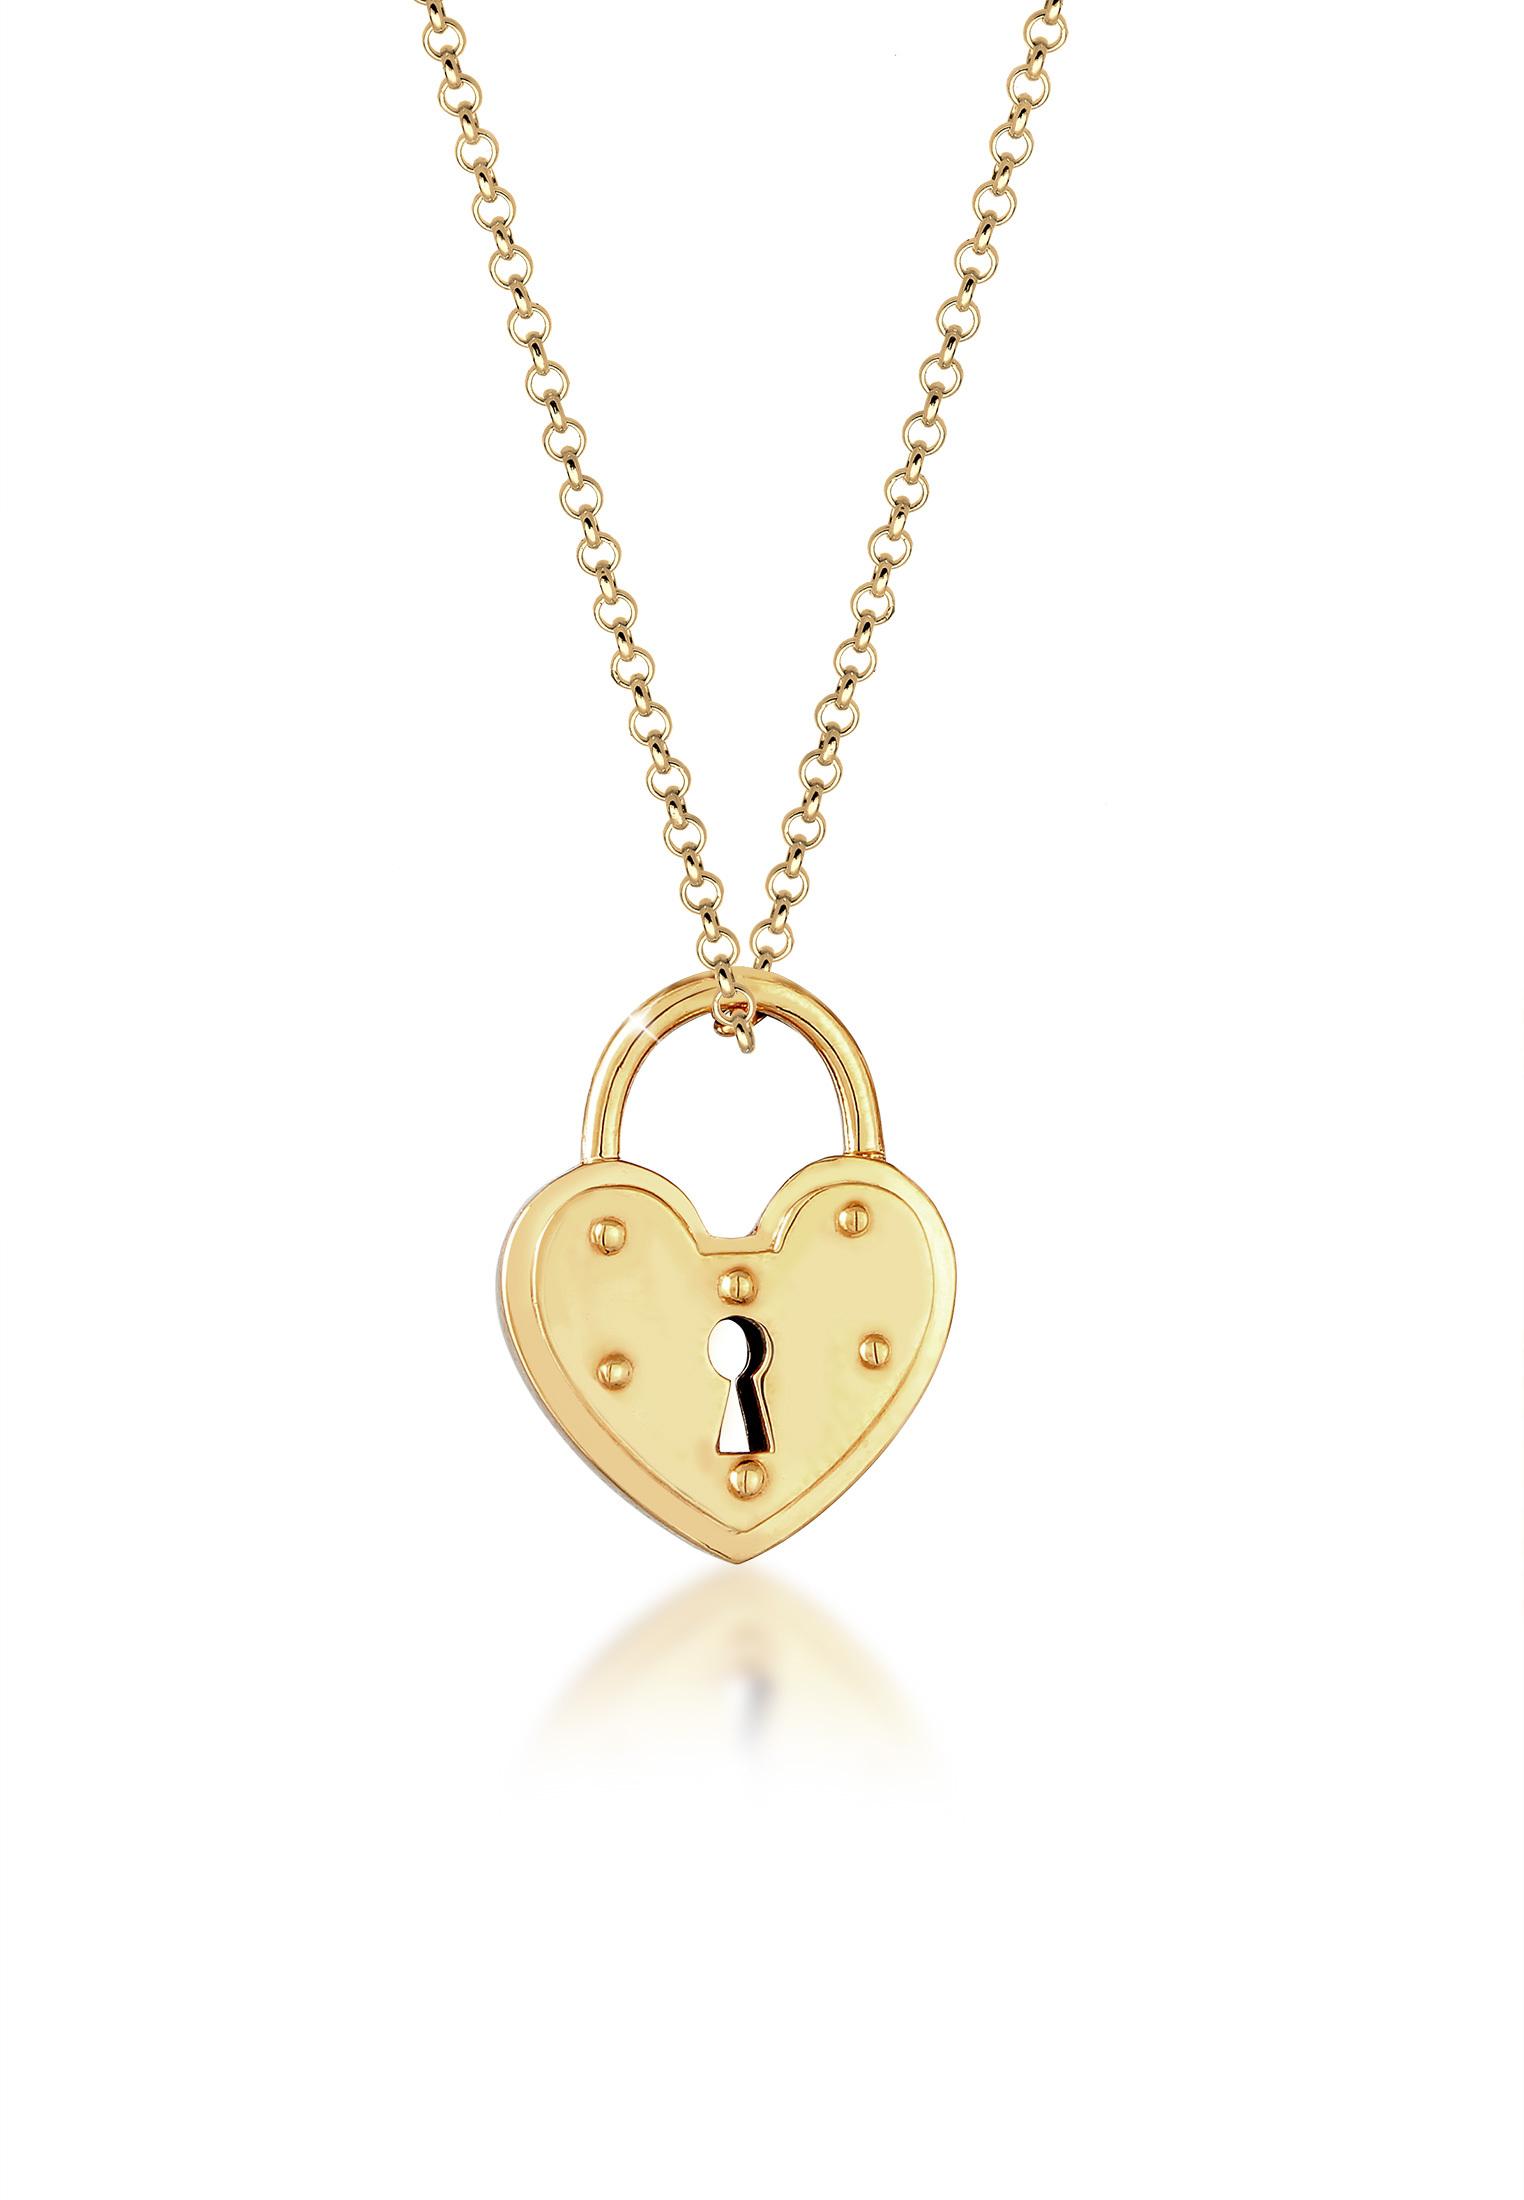 Halskette Herz | 925 Sterling Silber vergoldet